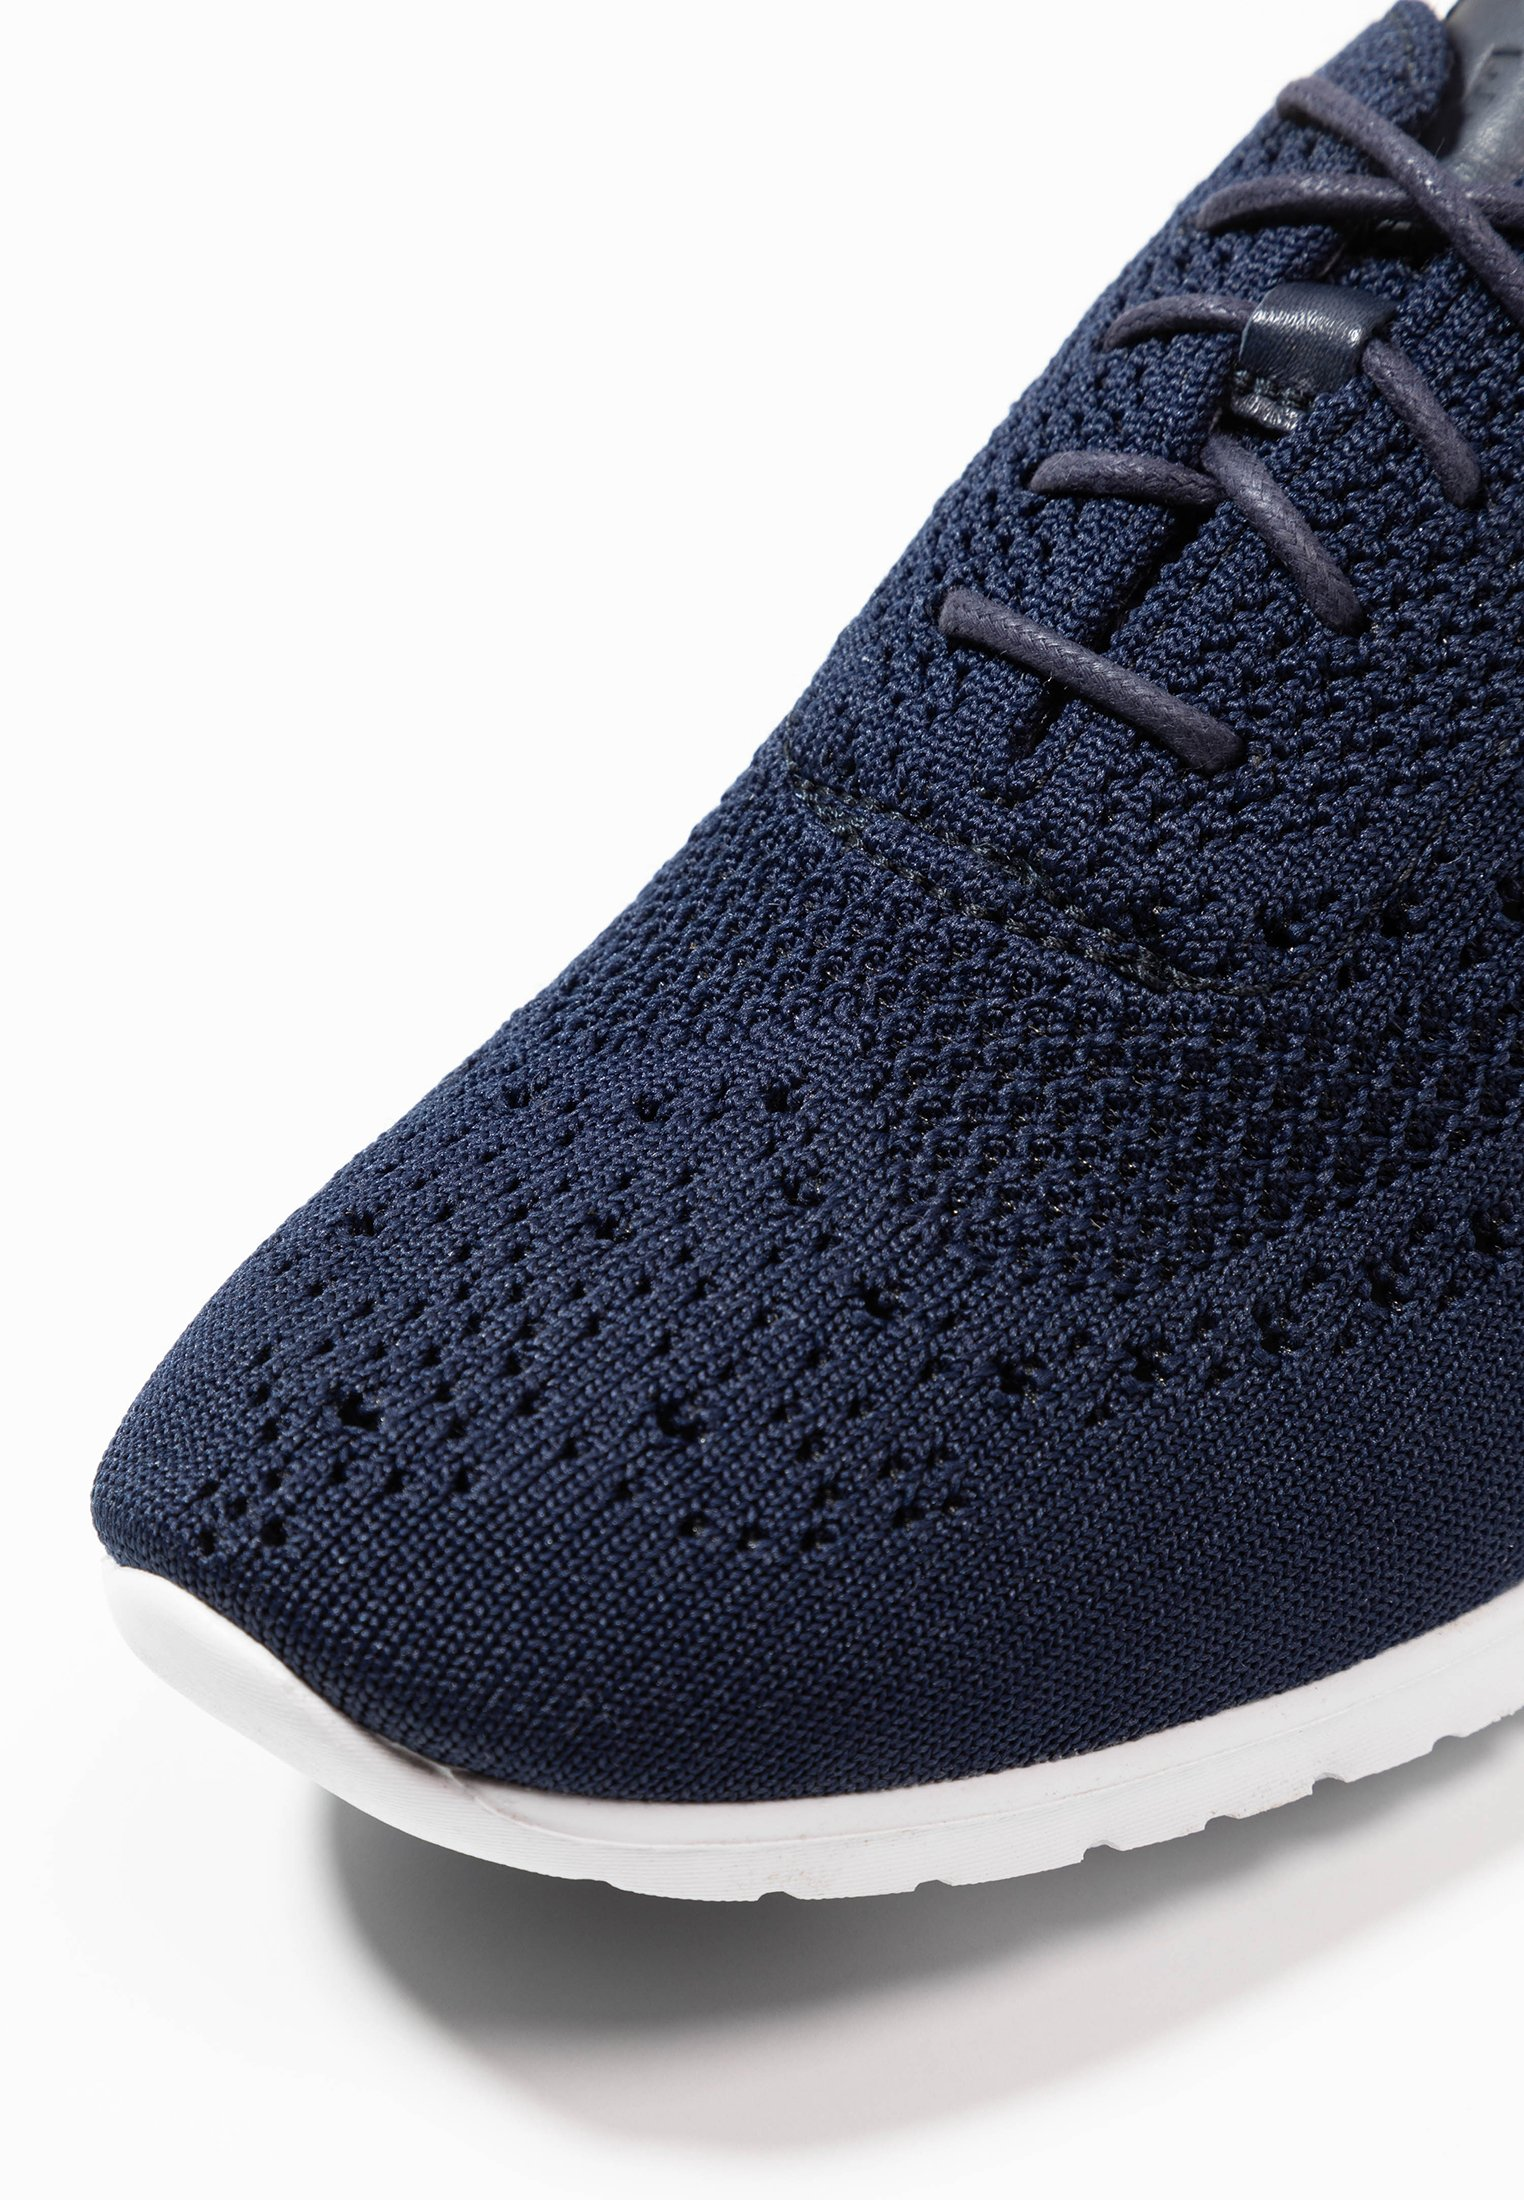 Cole Haan ZEROGRAND STITCHLITE OXFORD - Sneakersy niskie - marine blue/optic white